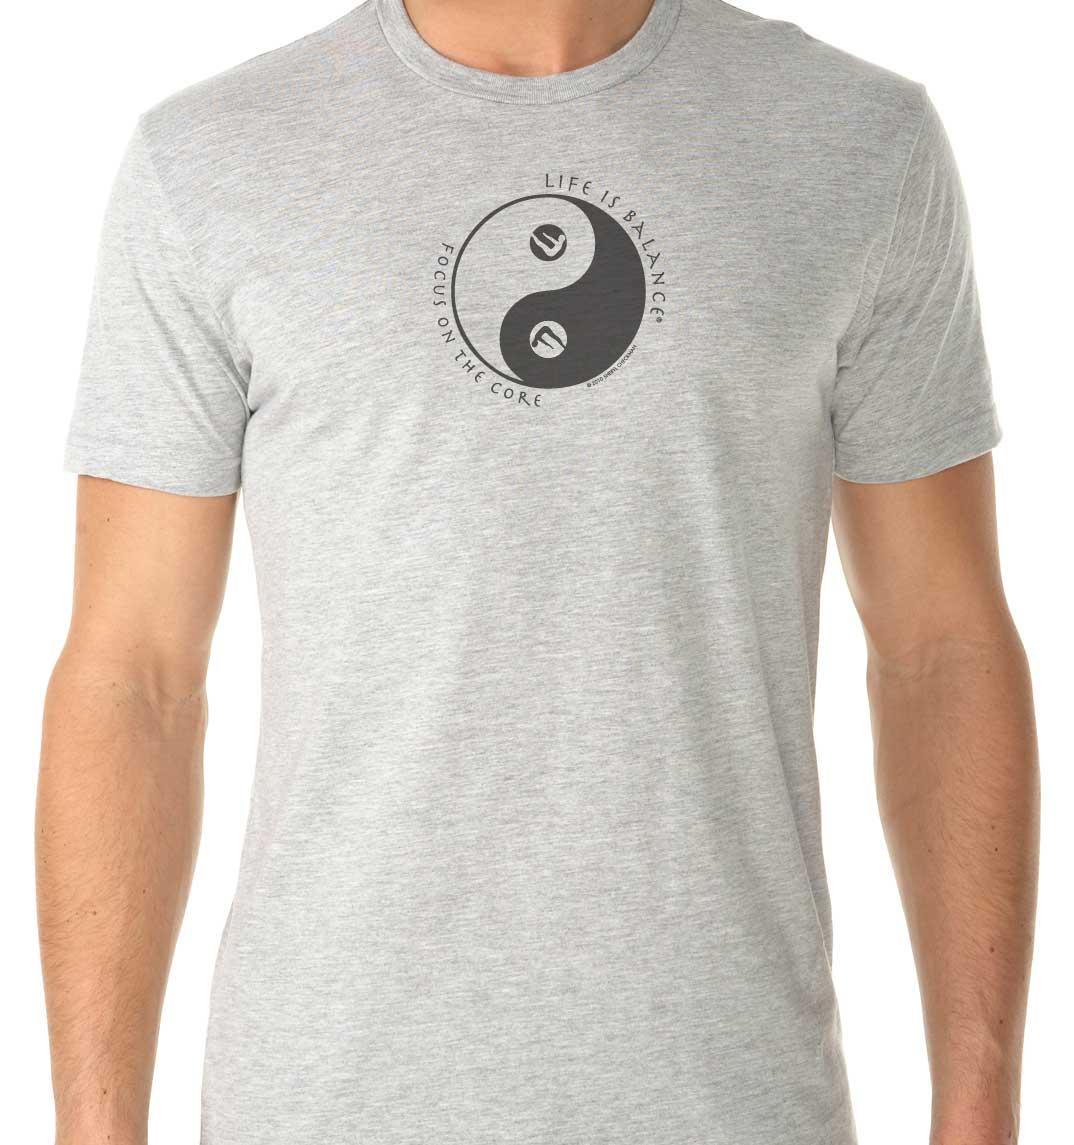 Pilates Men's/UnisexT-Shirt (Silverado/Black)